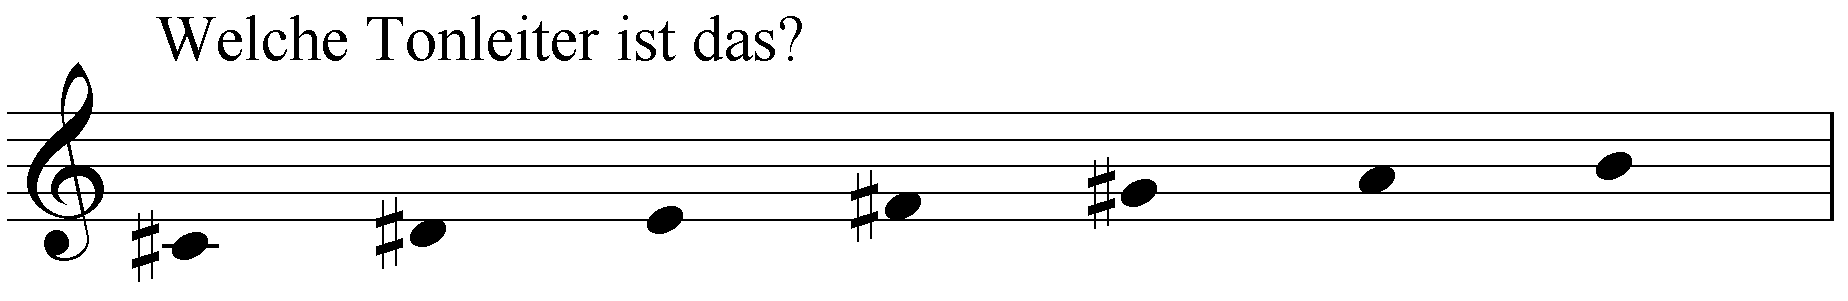 Welche Tonleiter ist das: cis dis e fis gis a h?